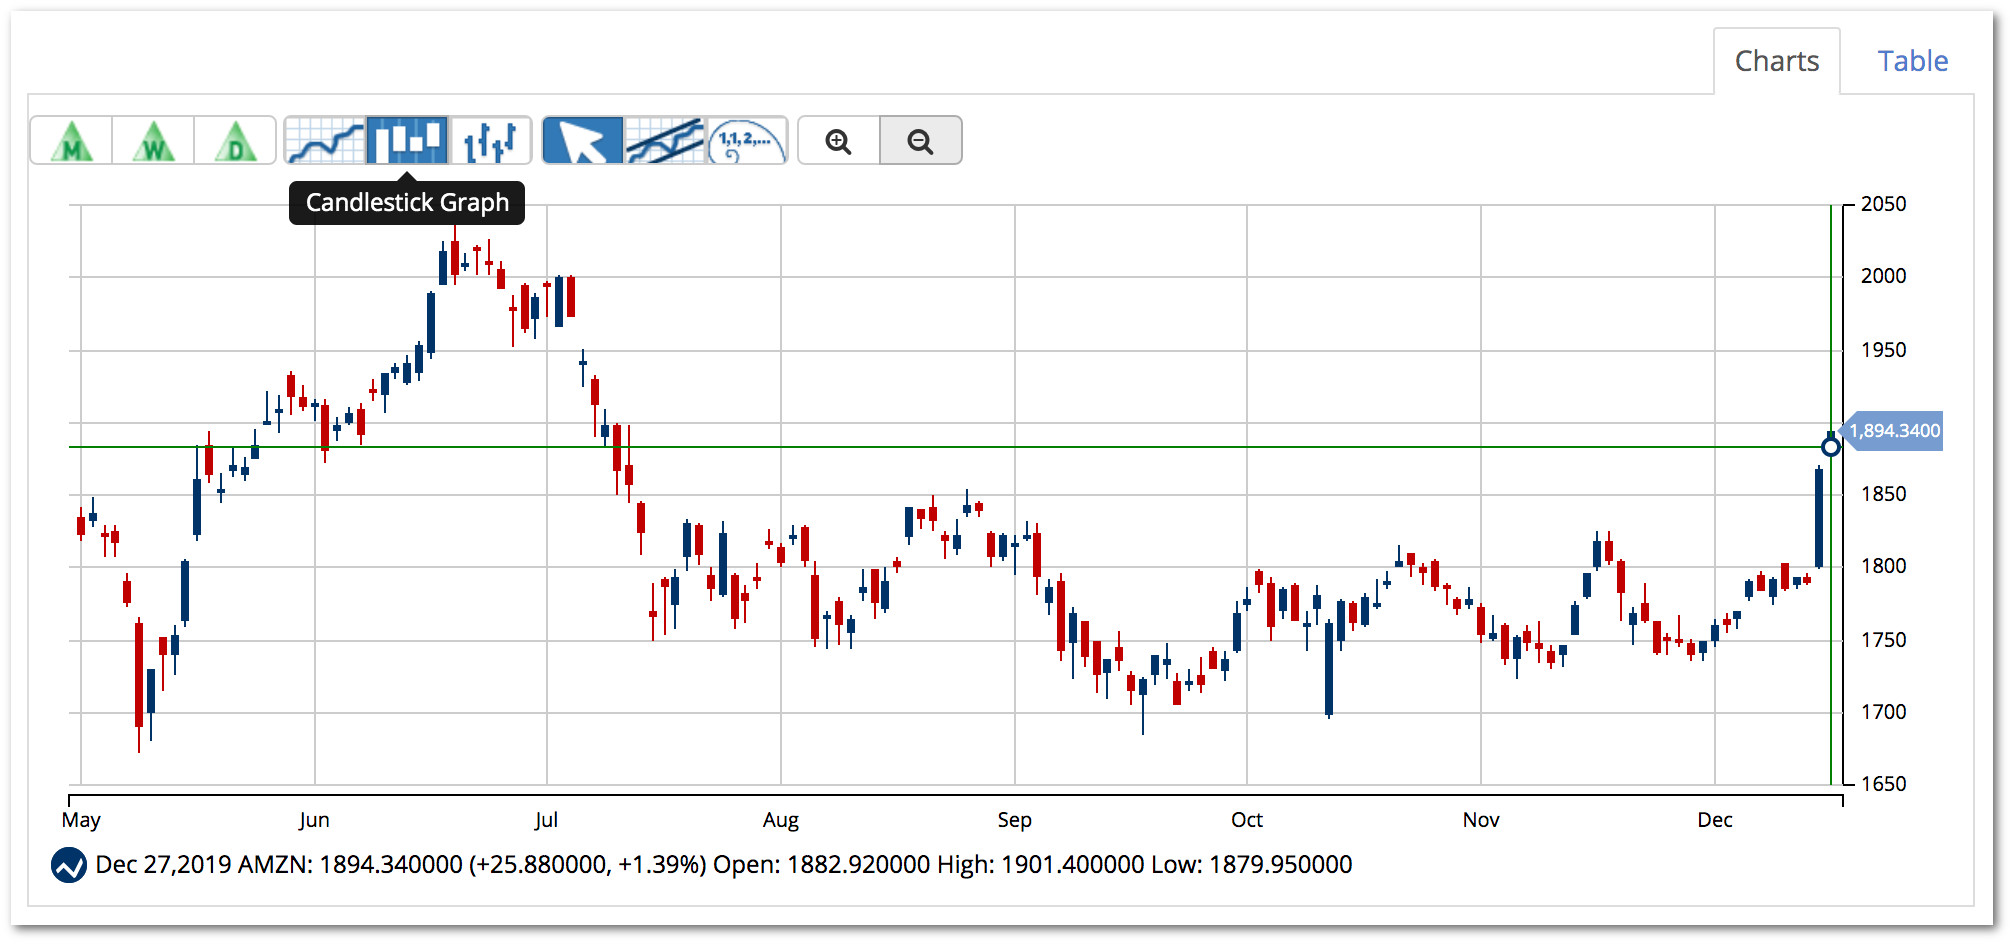 Candlestick Charts - Technical Analysis